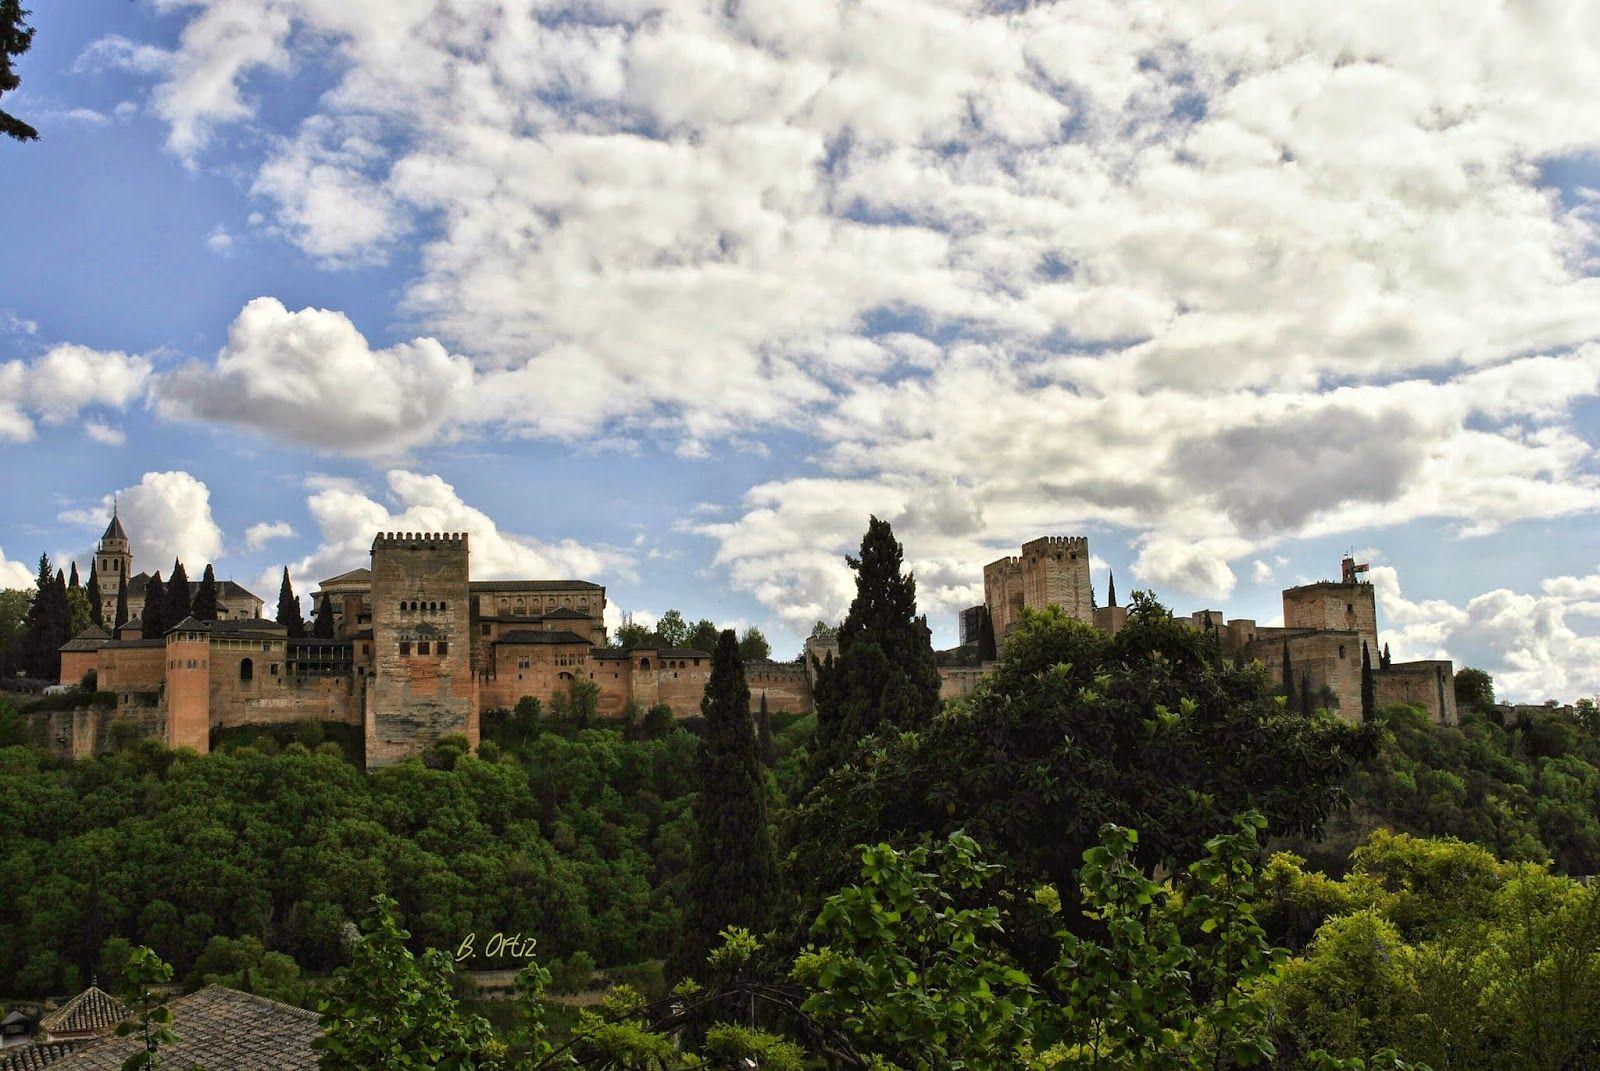 La Buhardilla de Yaya: Alhambra